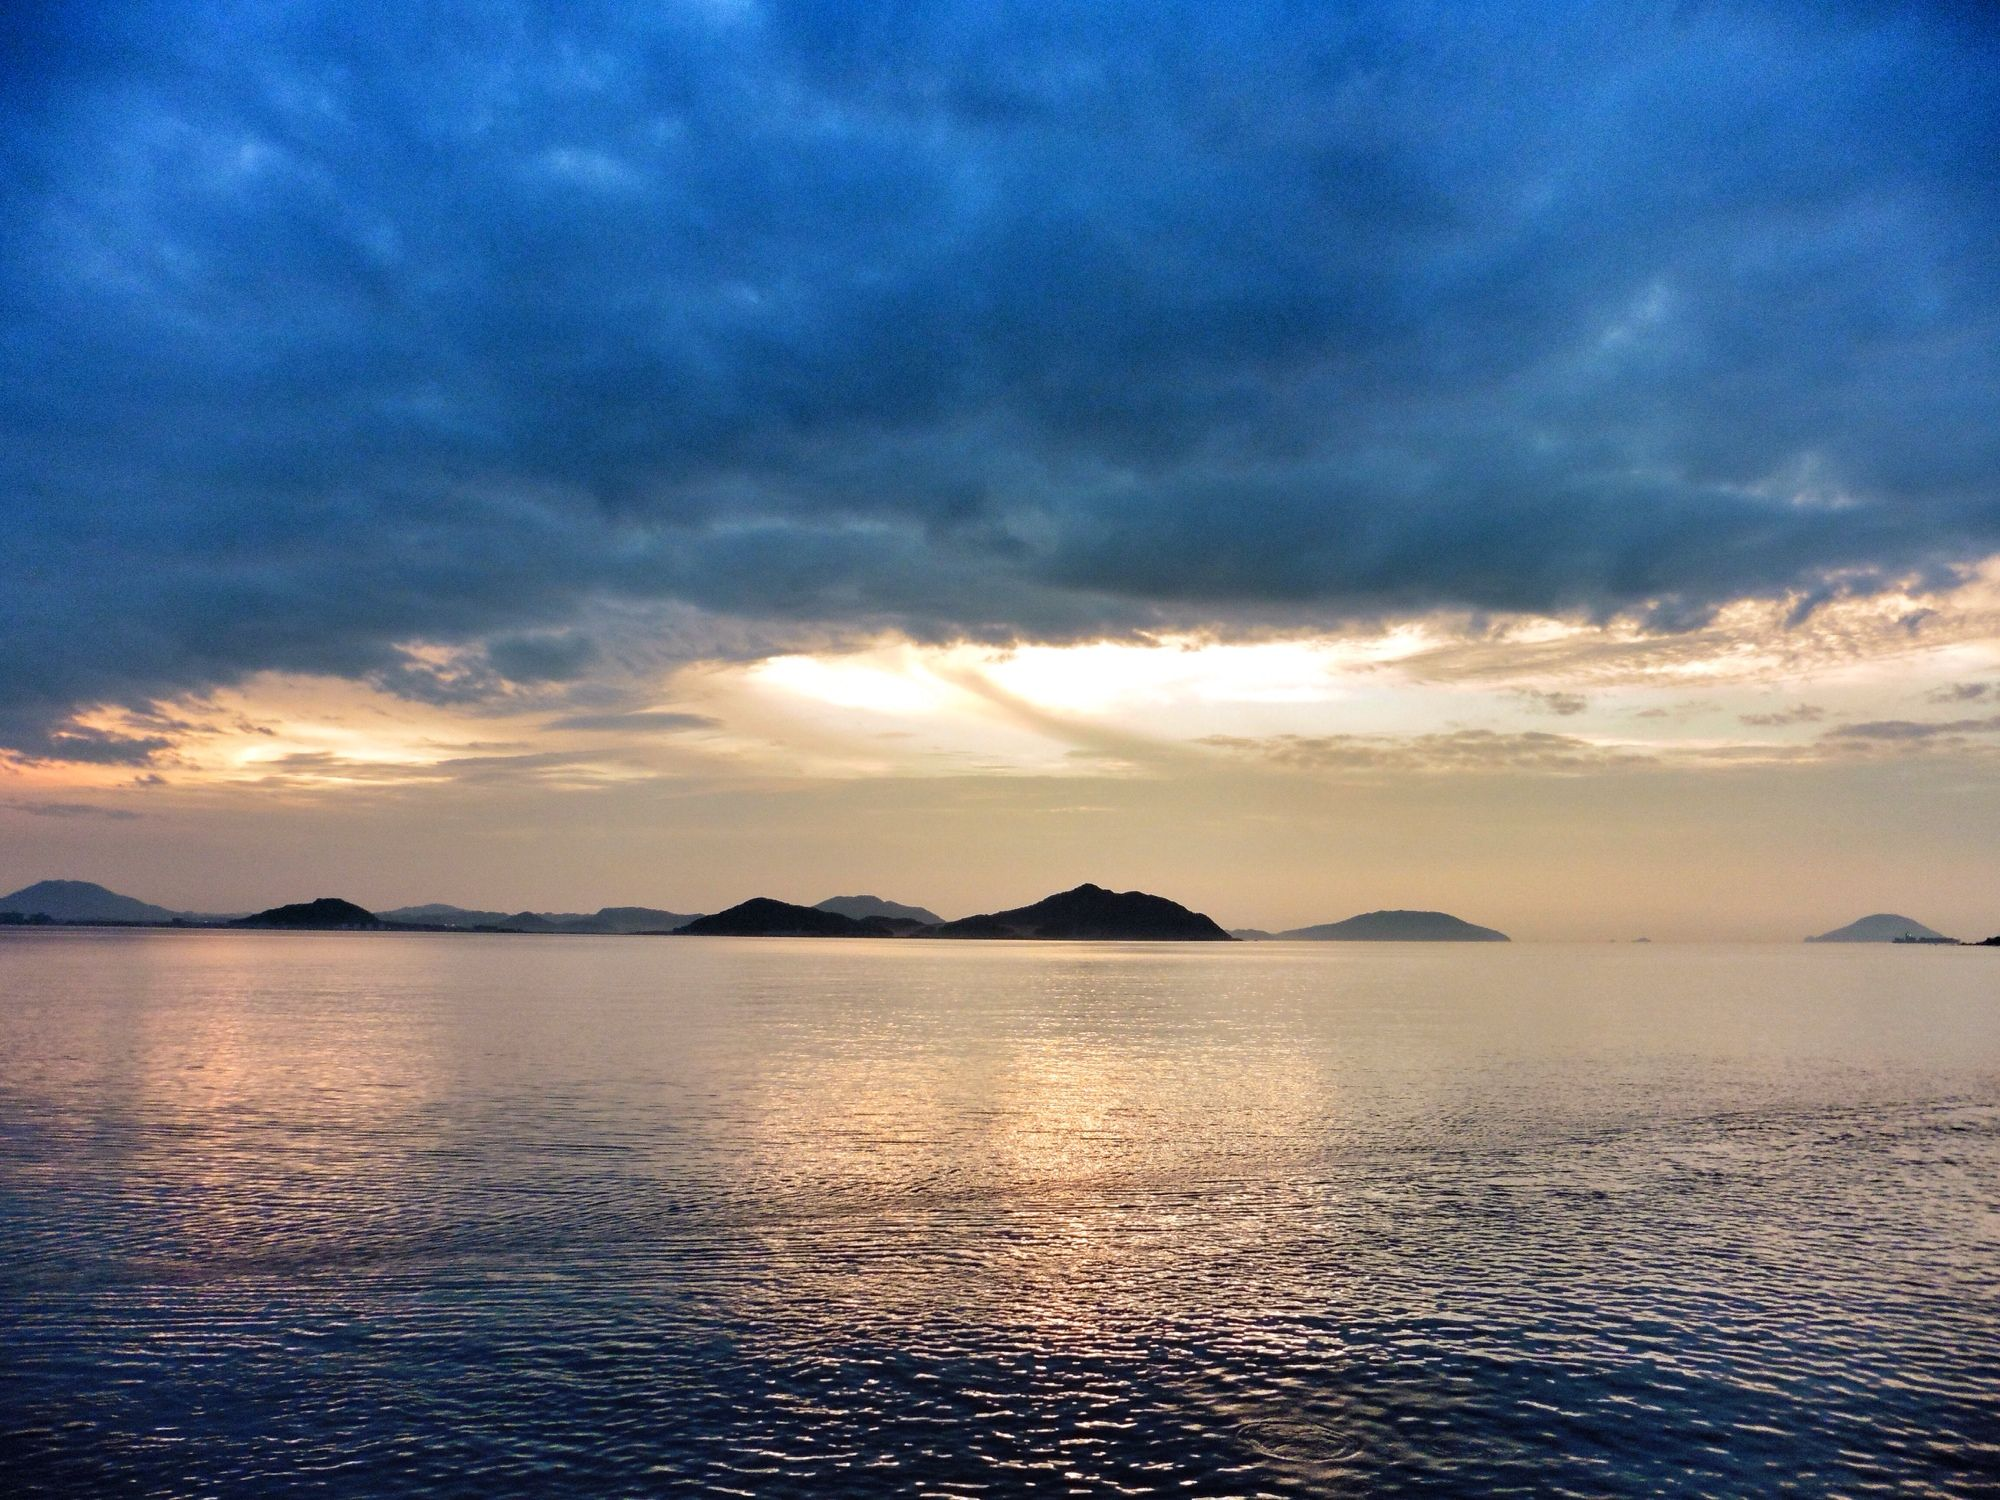 ( Evening Now at Hakata bay in Japan) 16 July 19:33  帯状のうす雲エリアで小焼けが始まった博多湾です。